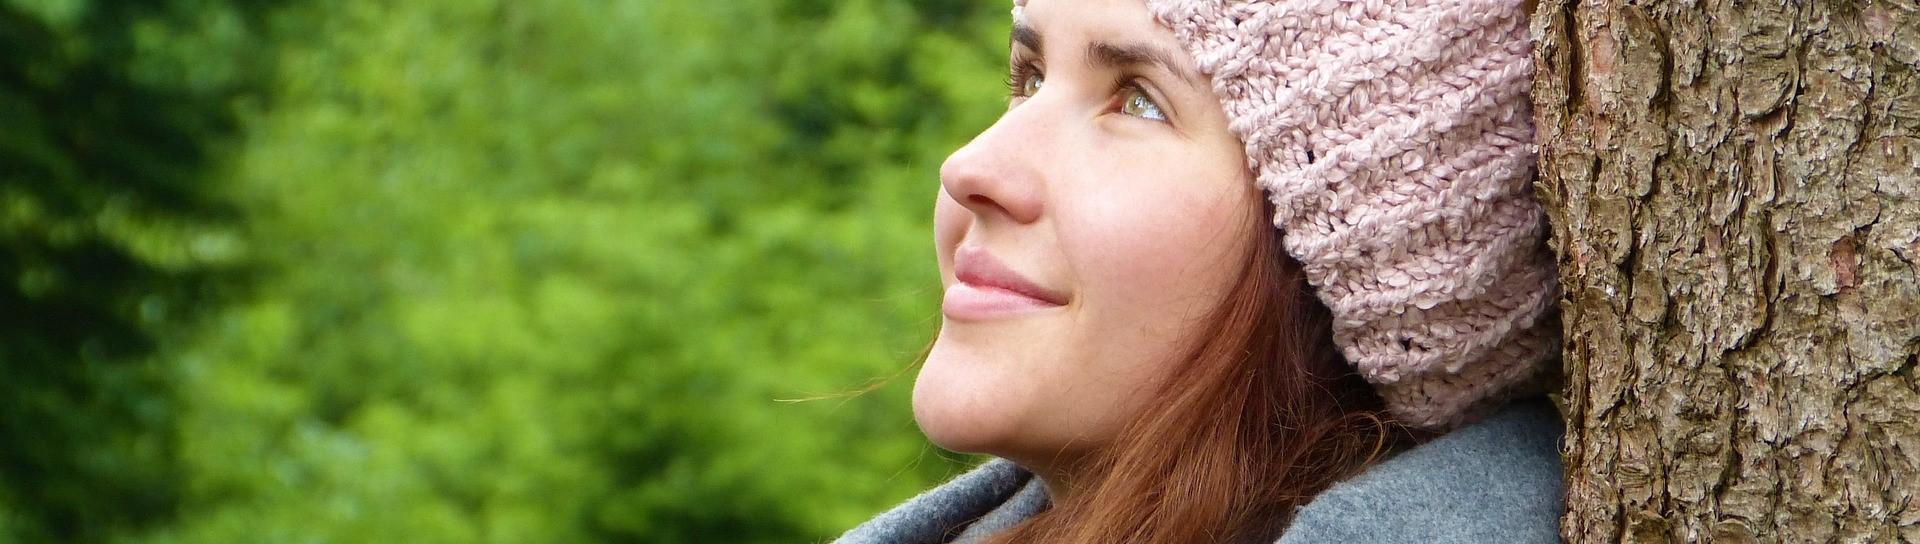 Woman Enjoying Outdoors in Glen Burnie, Maryland - CarDonations4Cancer.org